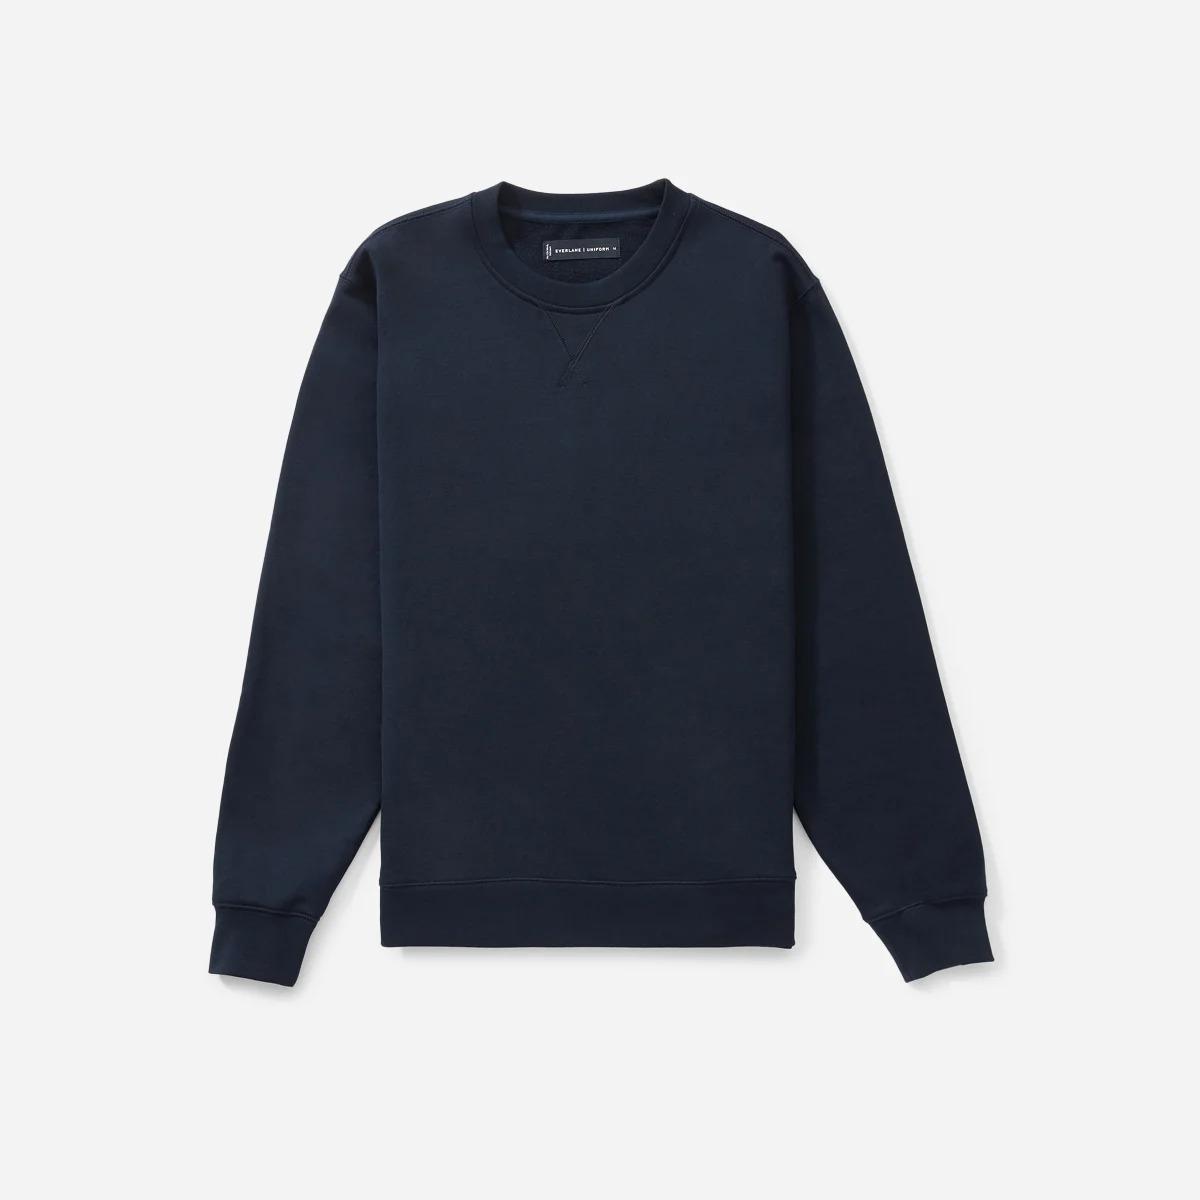 Everlane French Terry Crew Sweatshirt in navy